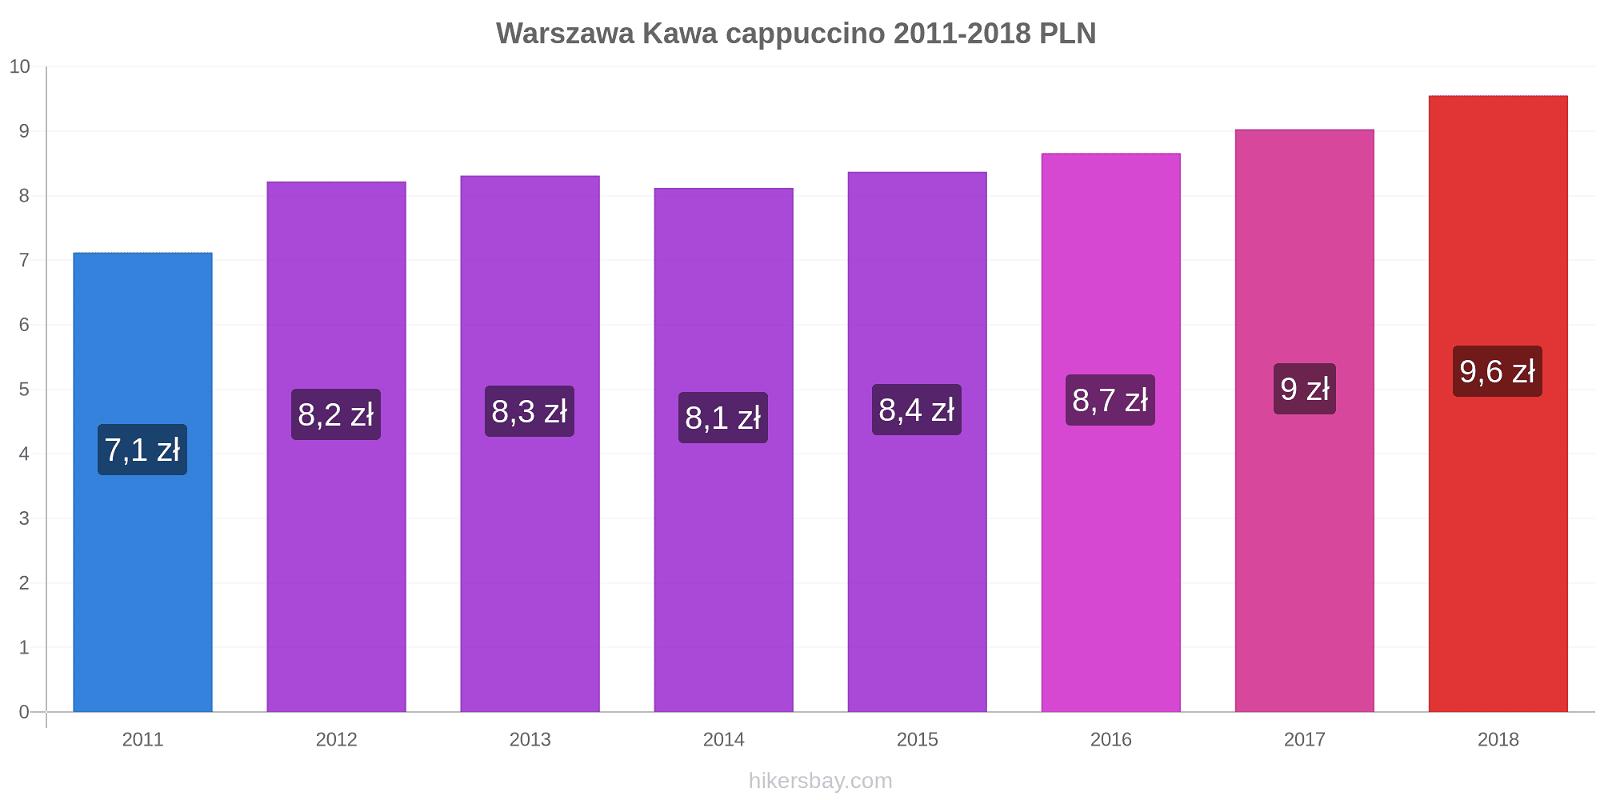 Warszawa zmiany cen Kawa cappuccino hikersbay.com